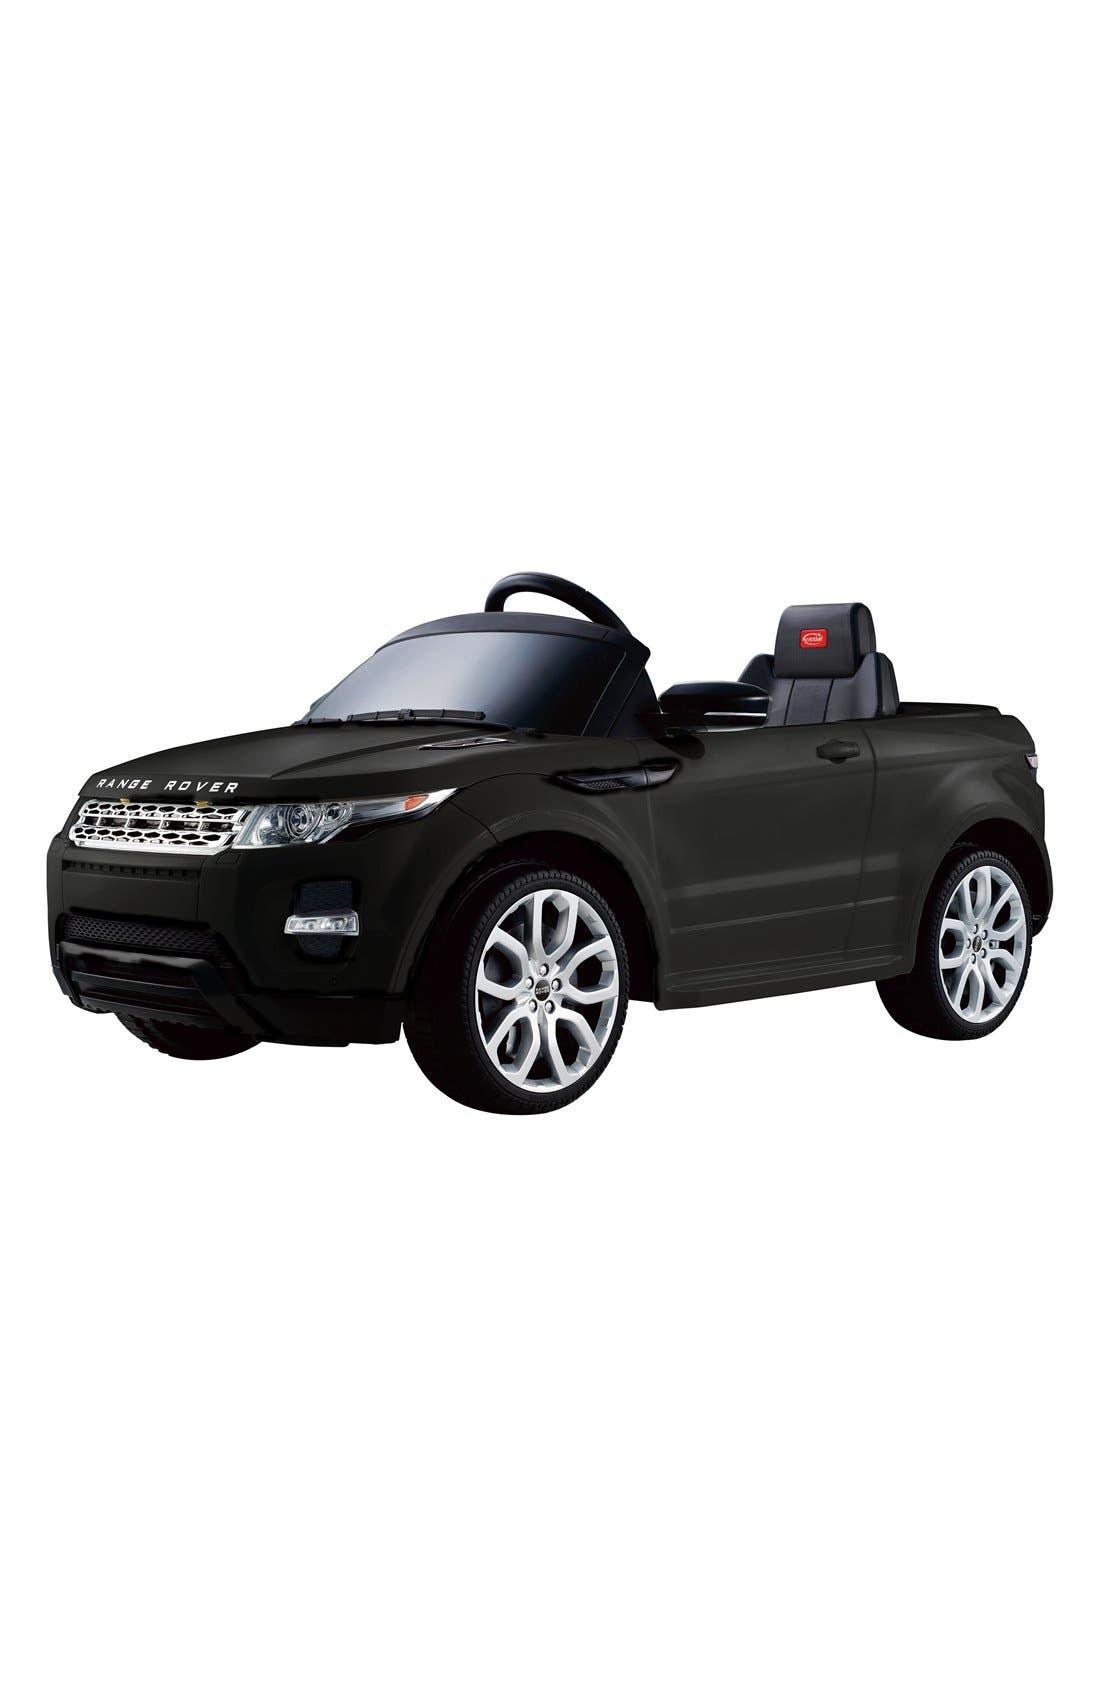 'Range Rover Evoque' 12V RC Ride-On Toy Car,                             Main thumbnail 1, color,                             001